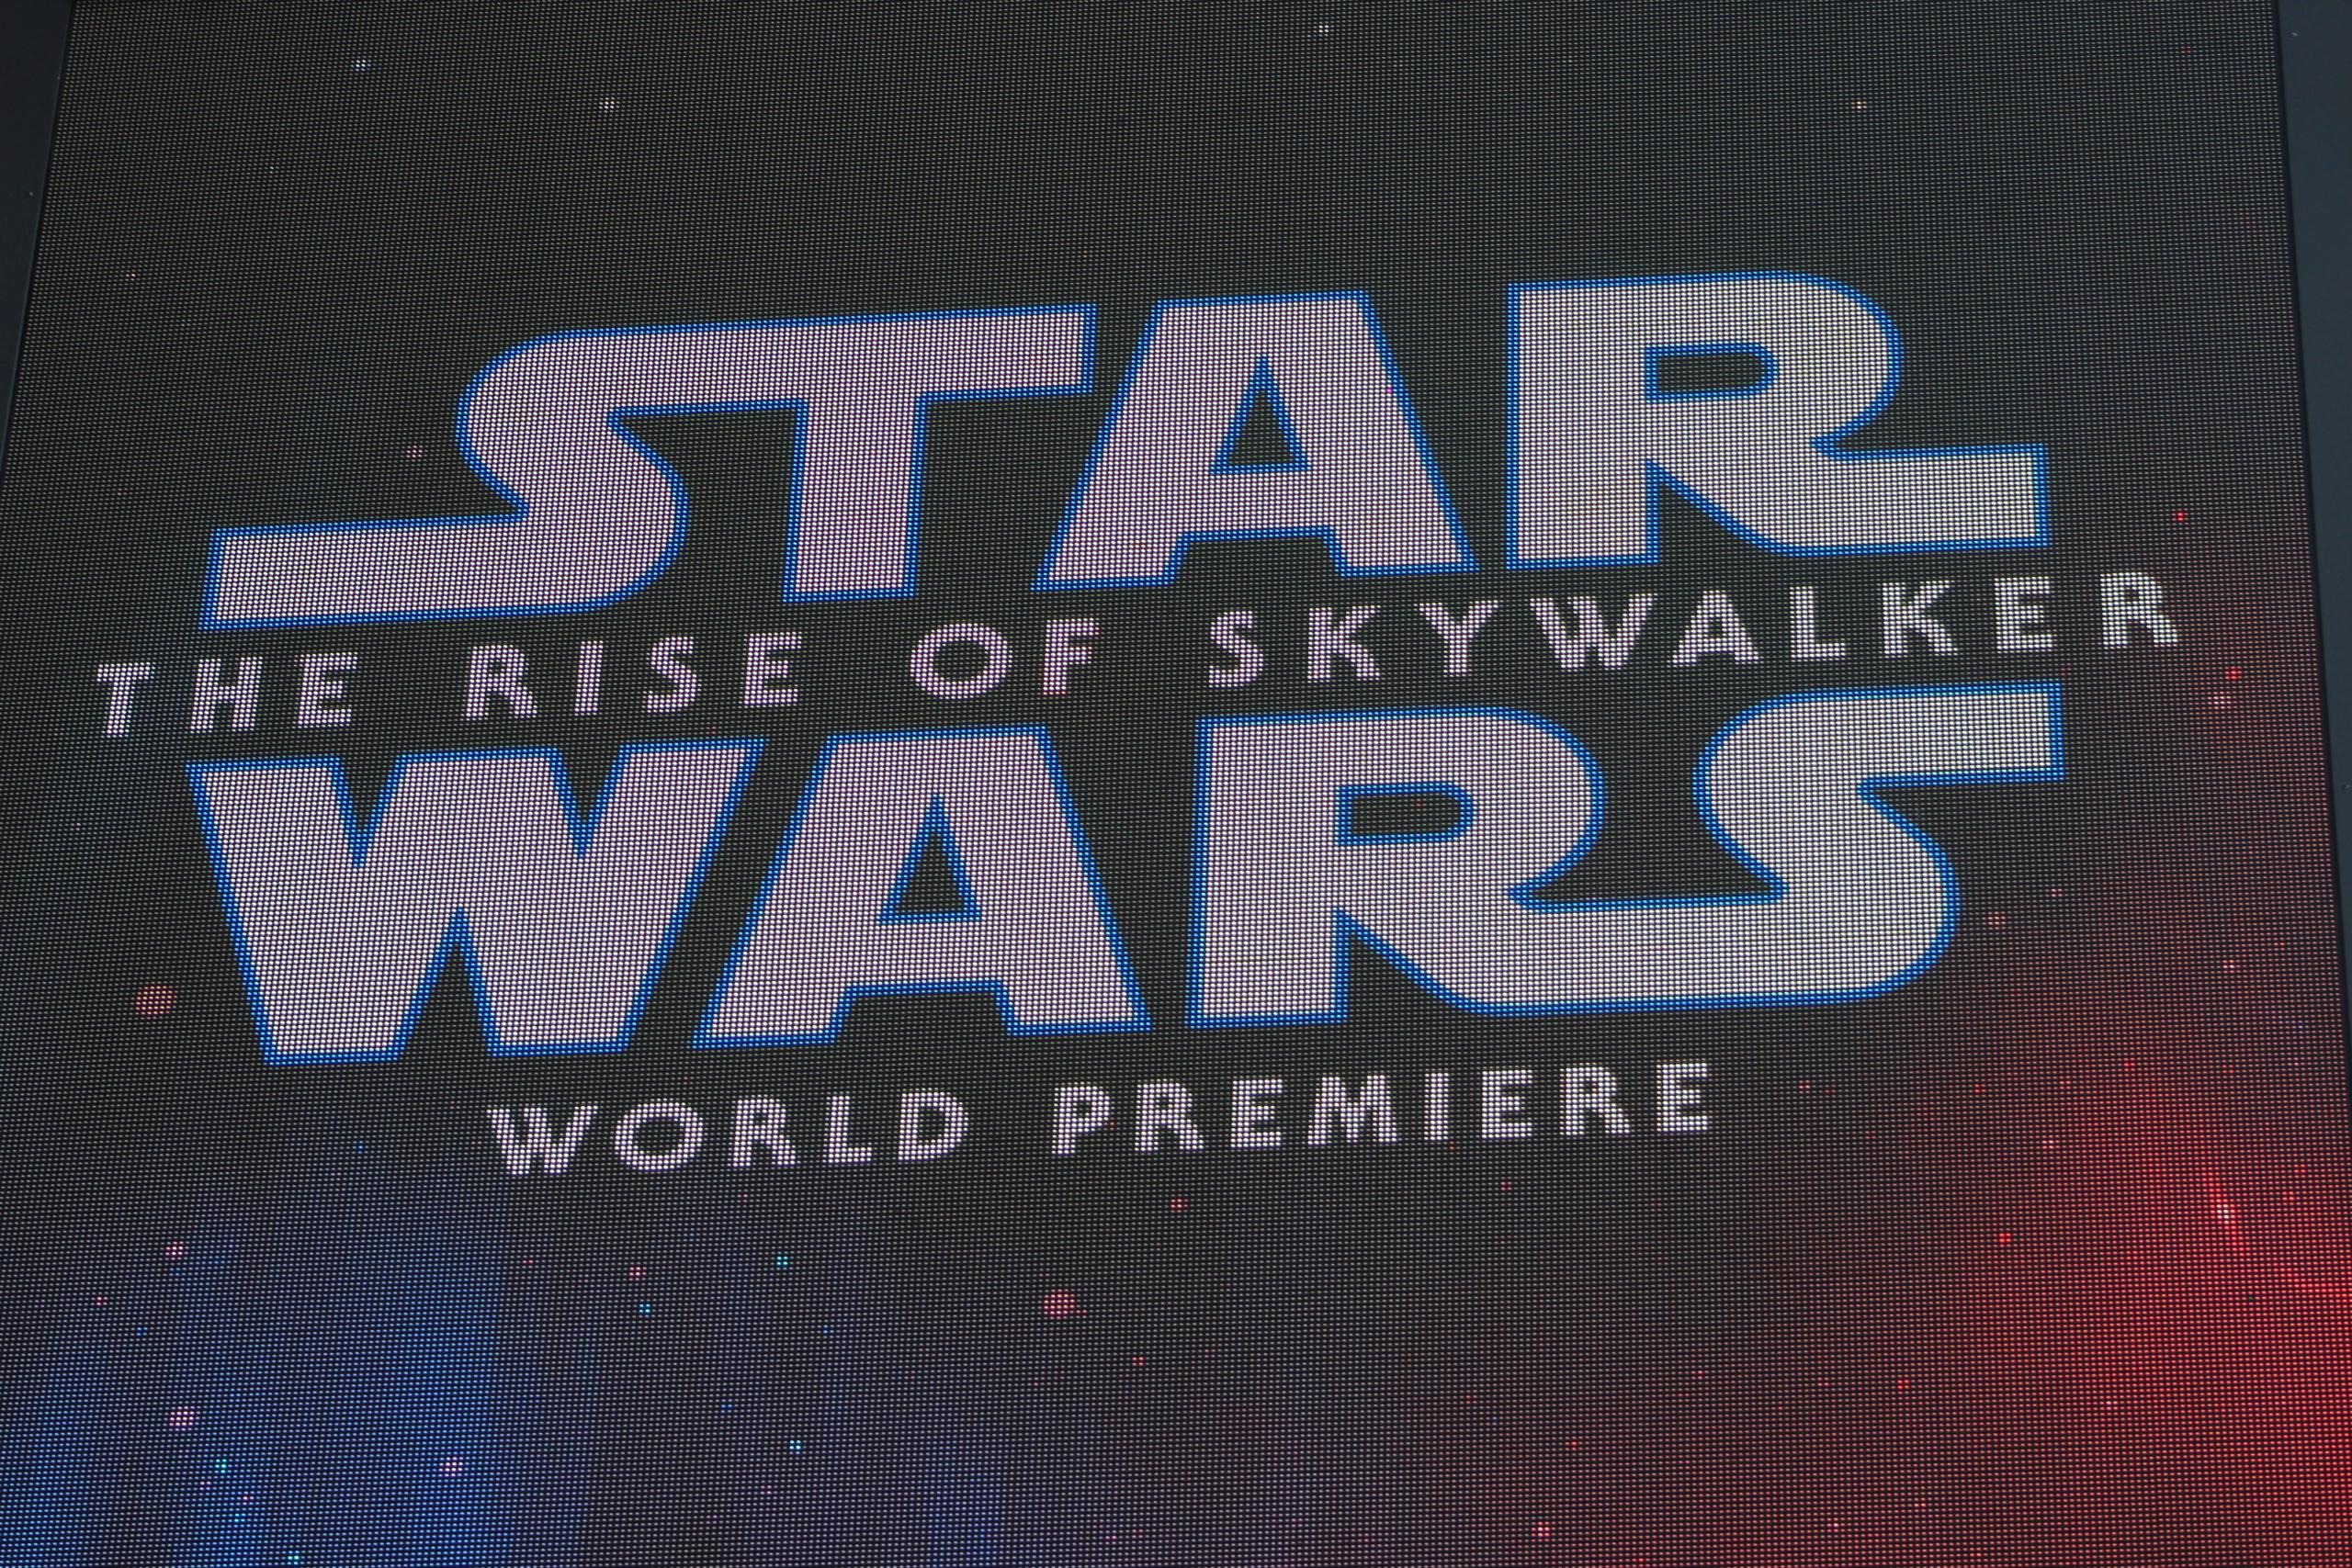 Star Wars: Rise of Skywalker World Premiere Marquee